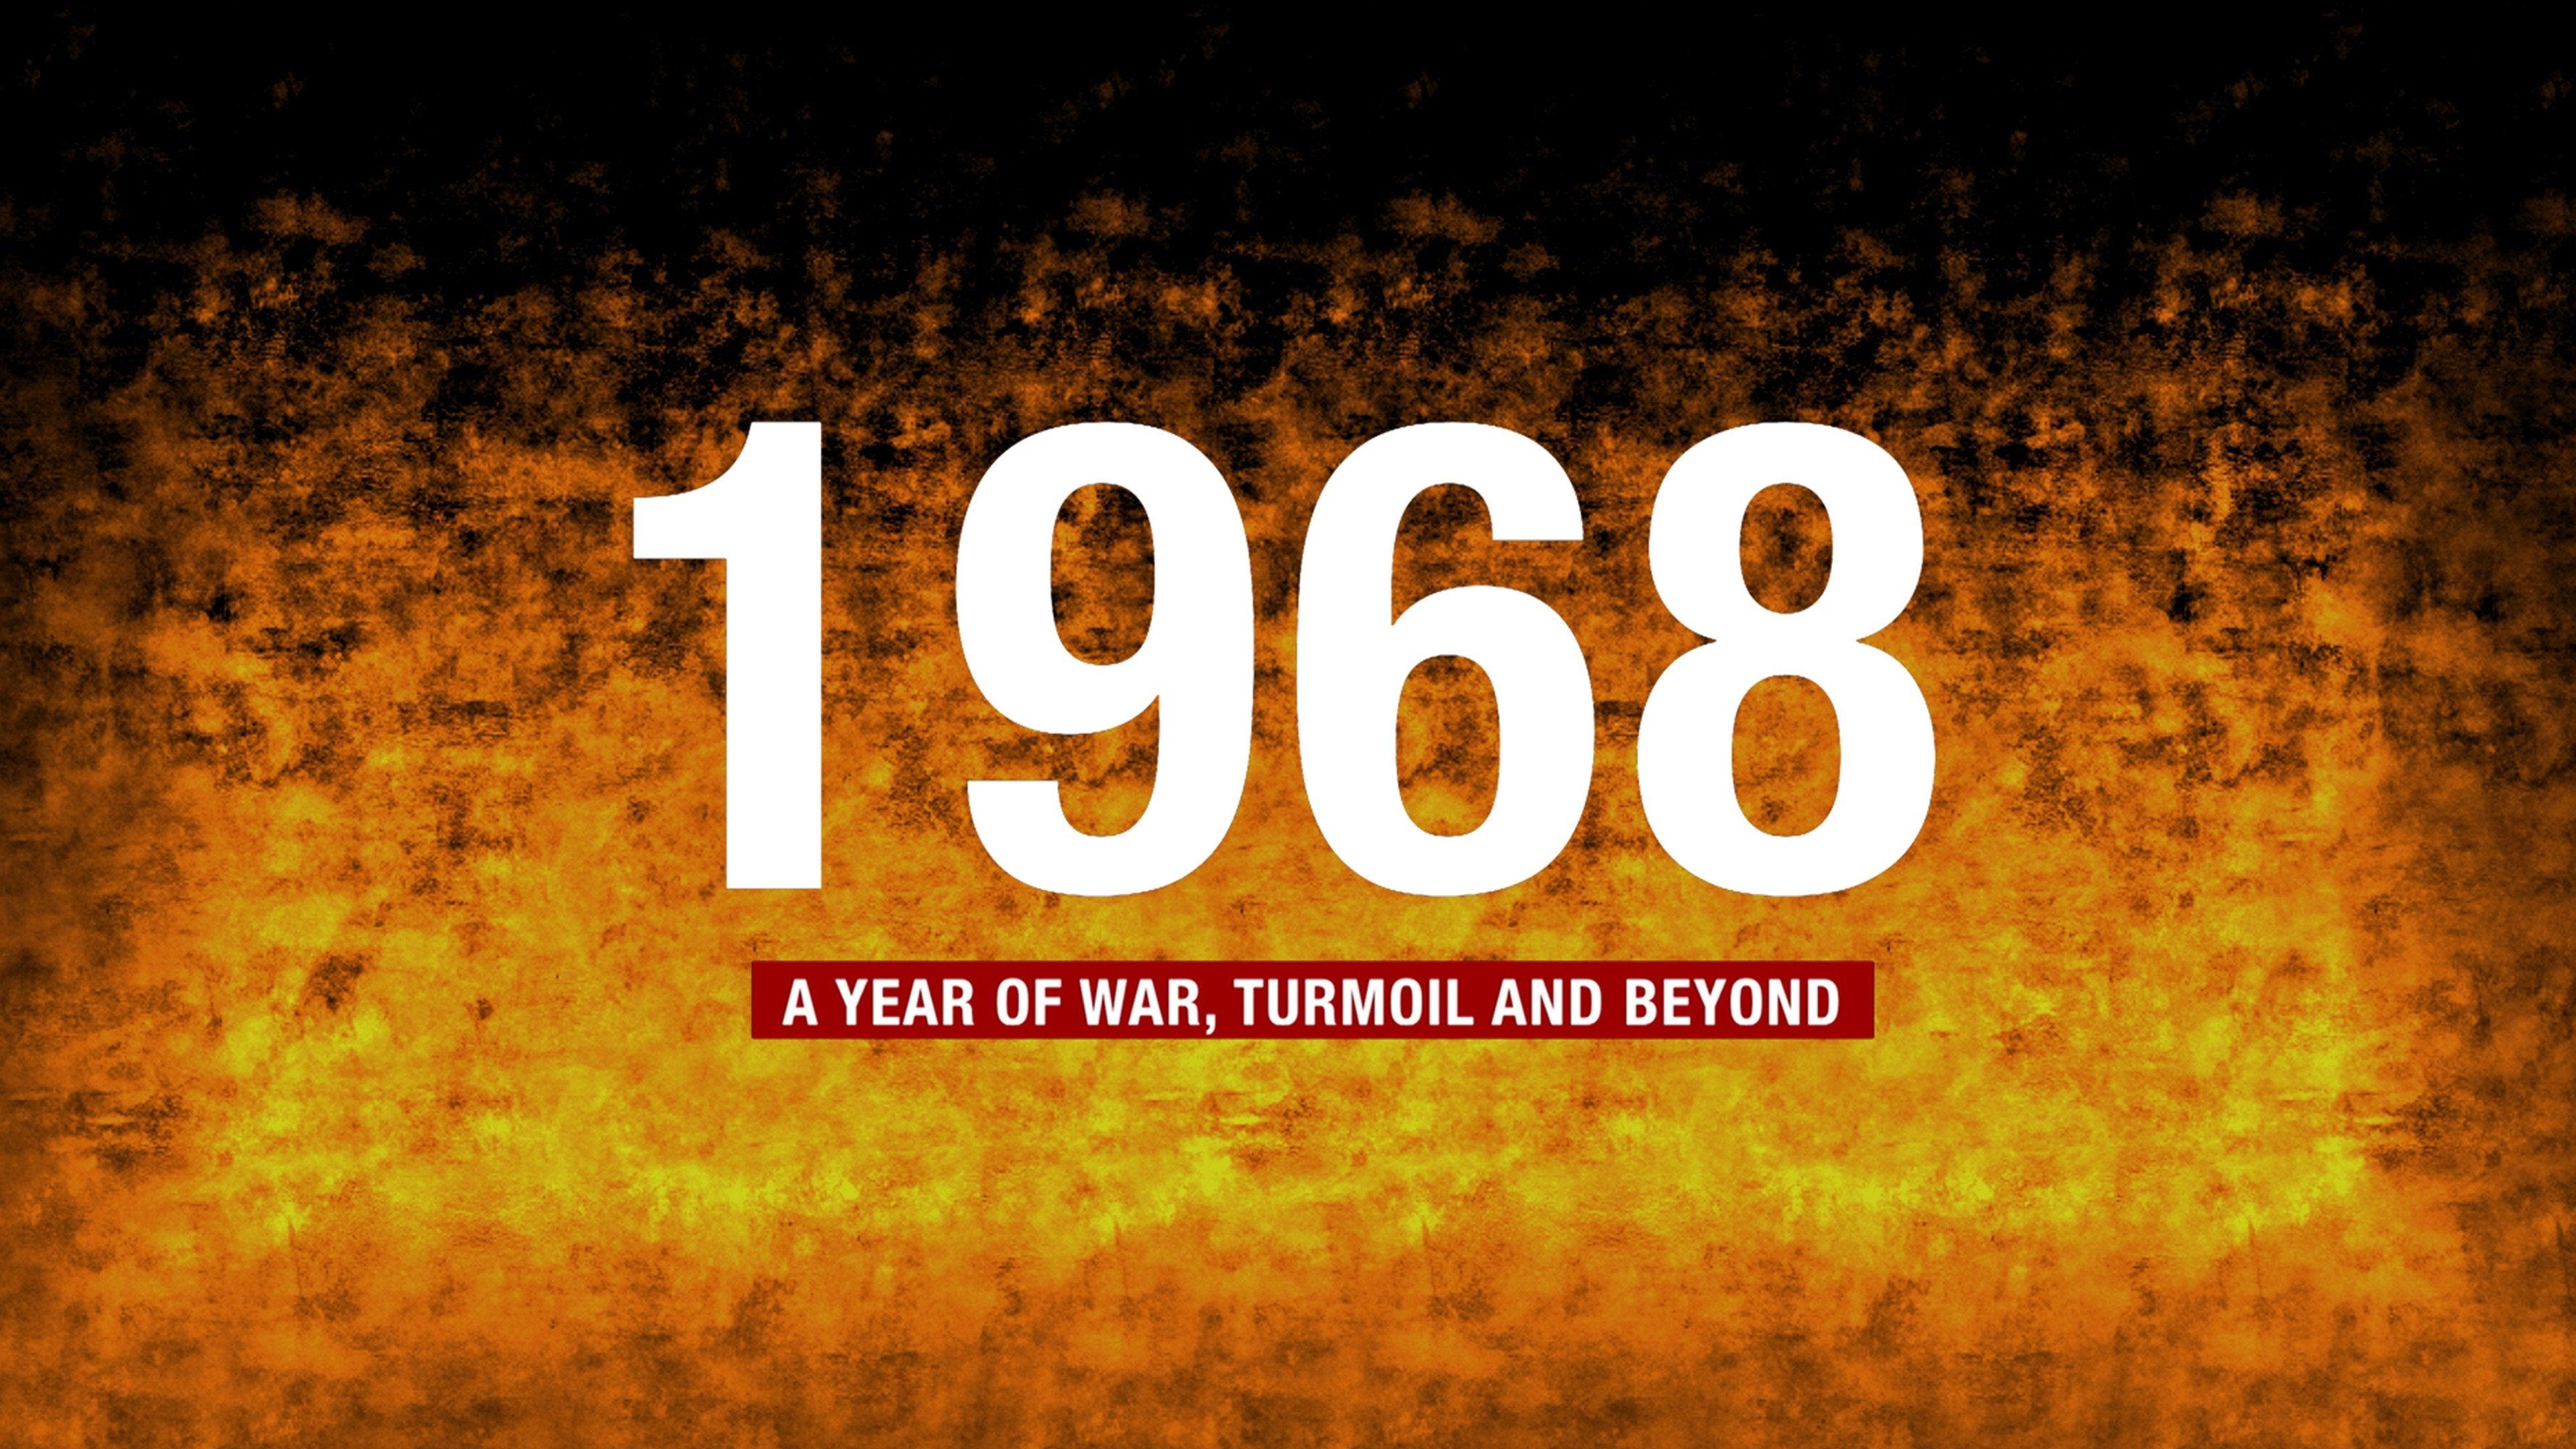 A Year of War, Turmoil & Beyond: 1968